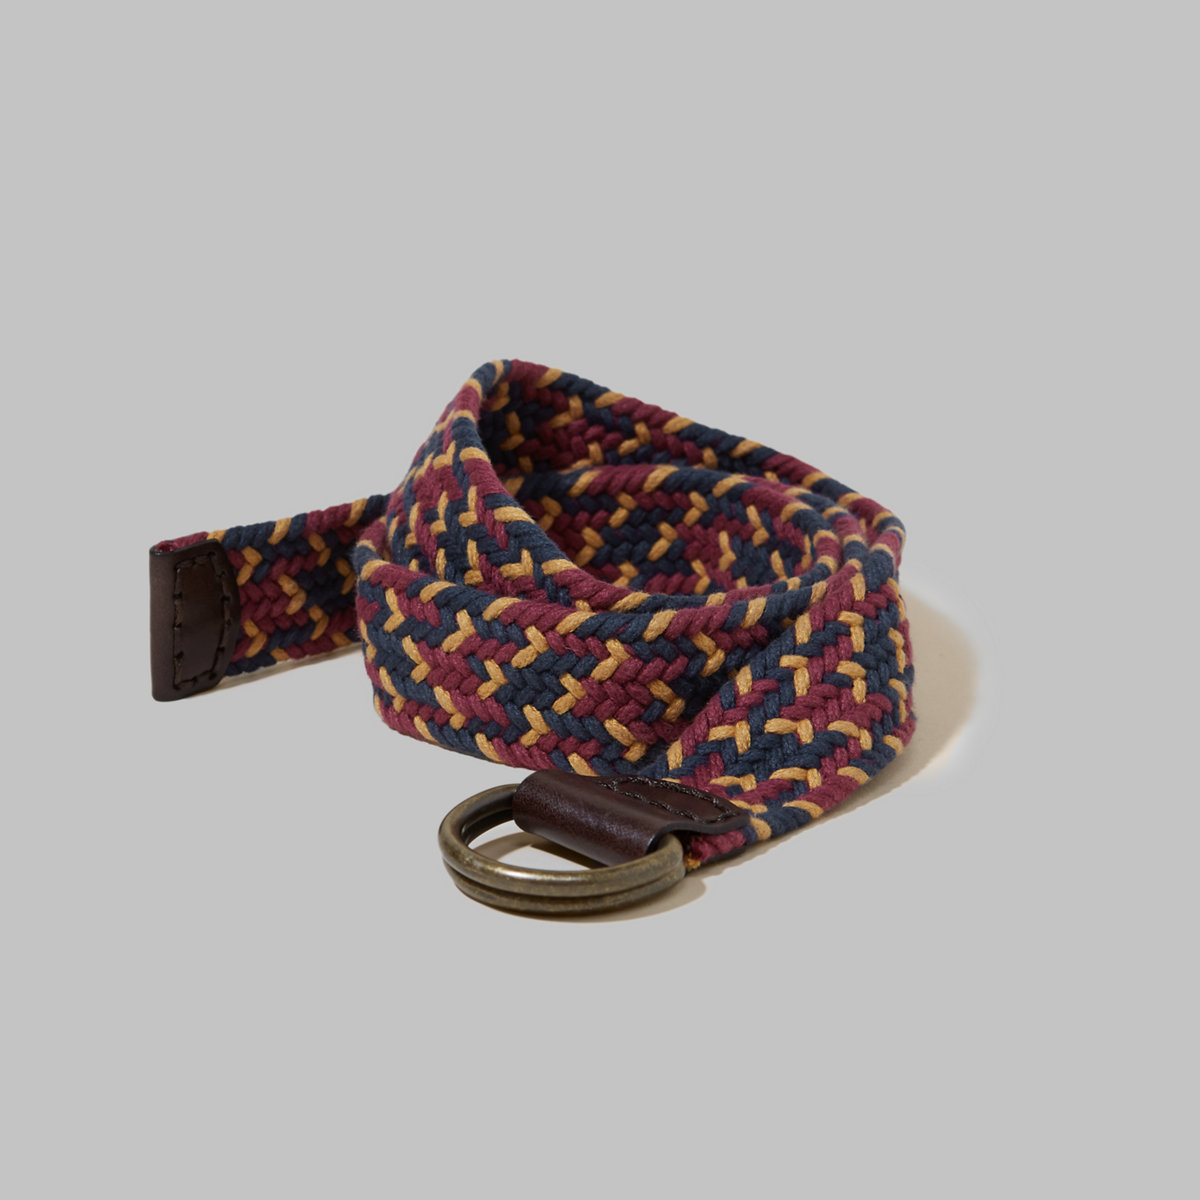 Patterned Fabric Belt